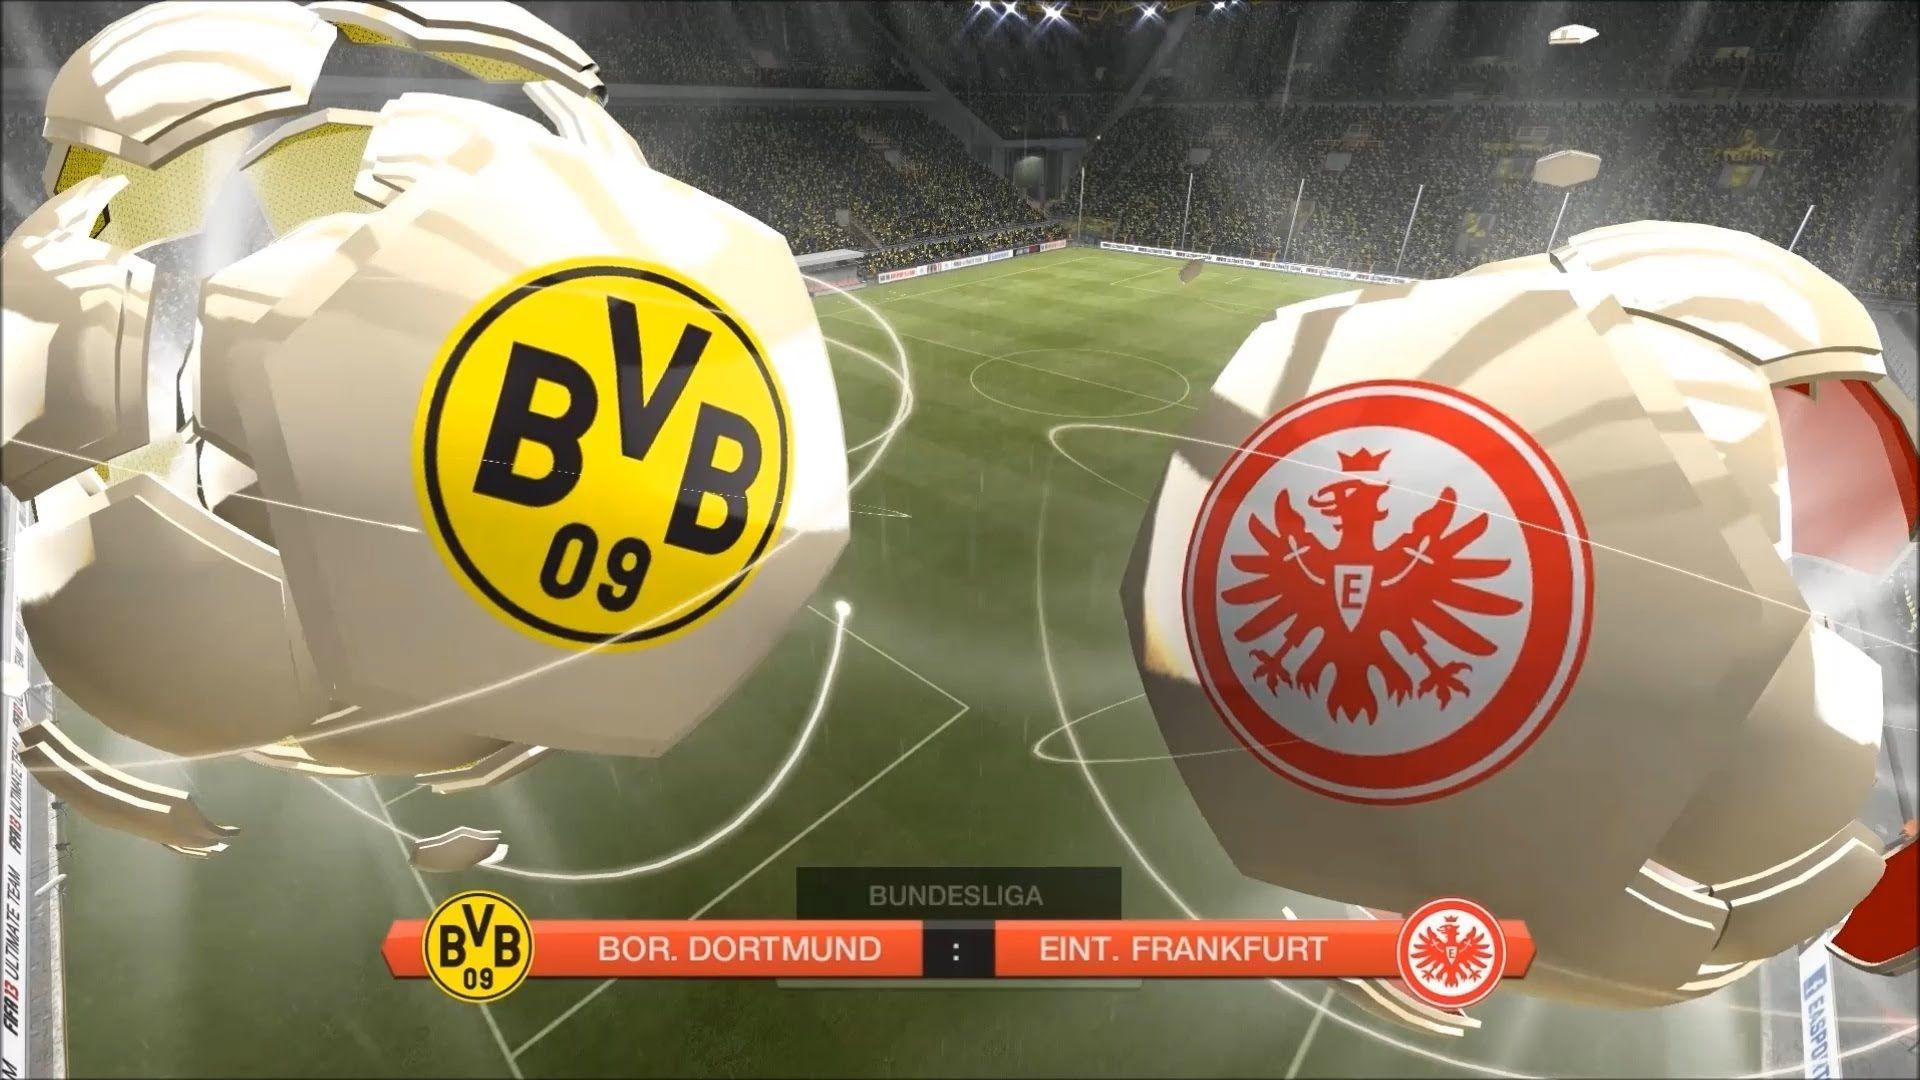 Prediksi Skor Borussia Dortmund vs Eintracht Frankfurt 15